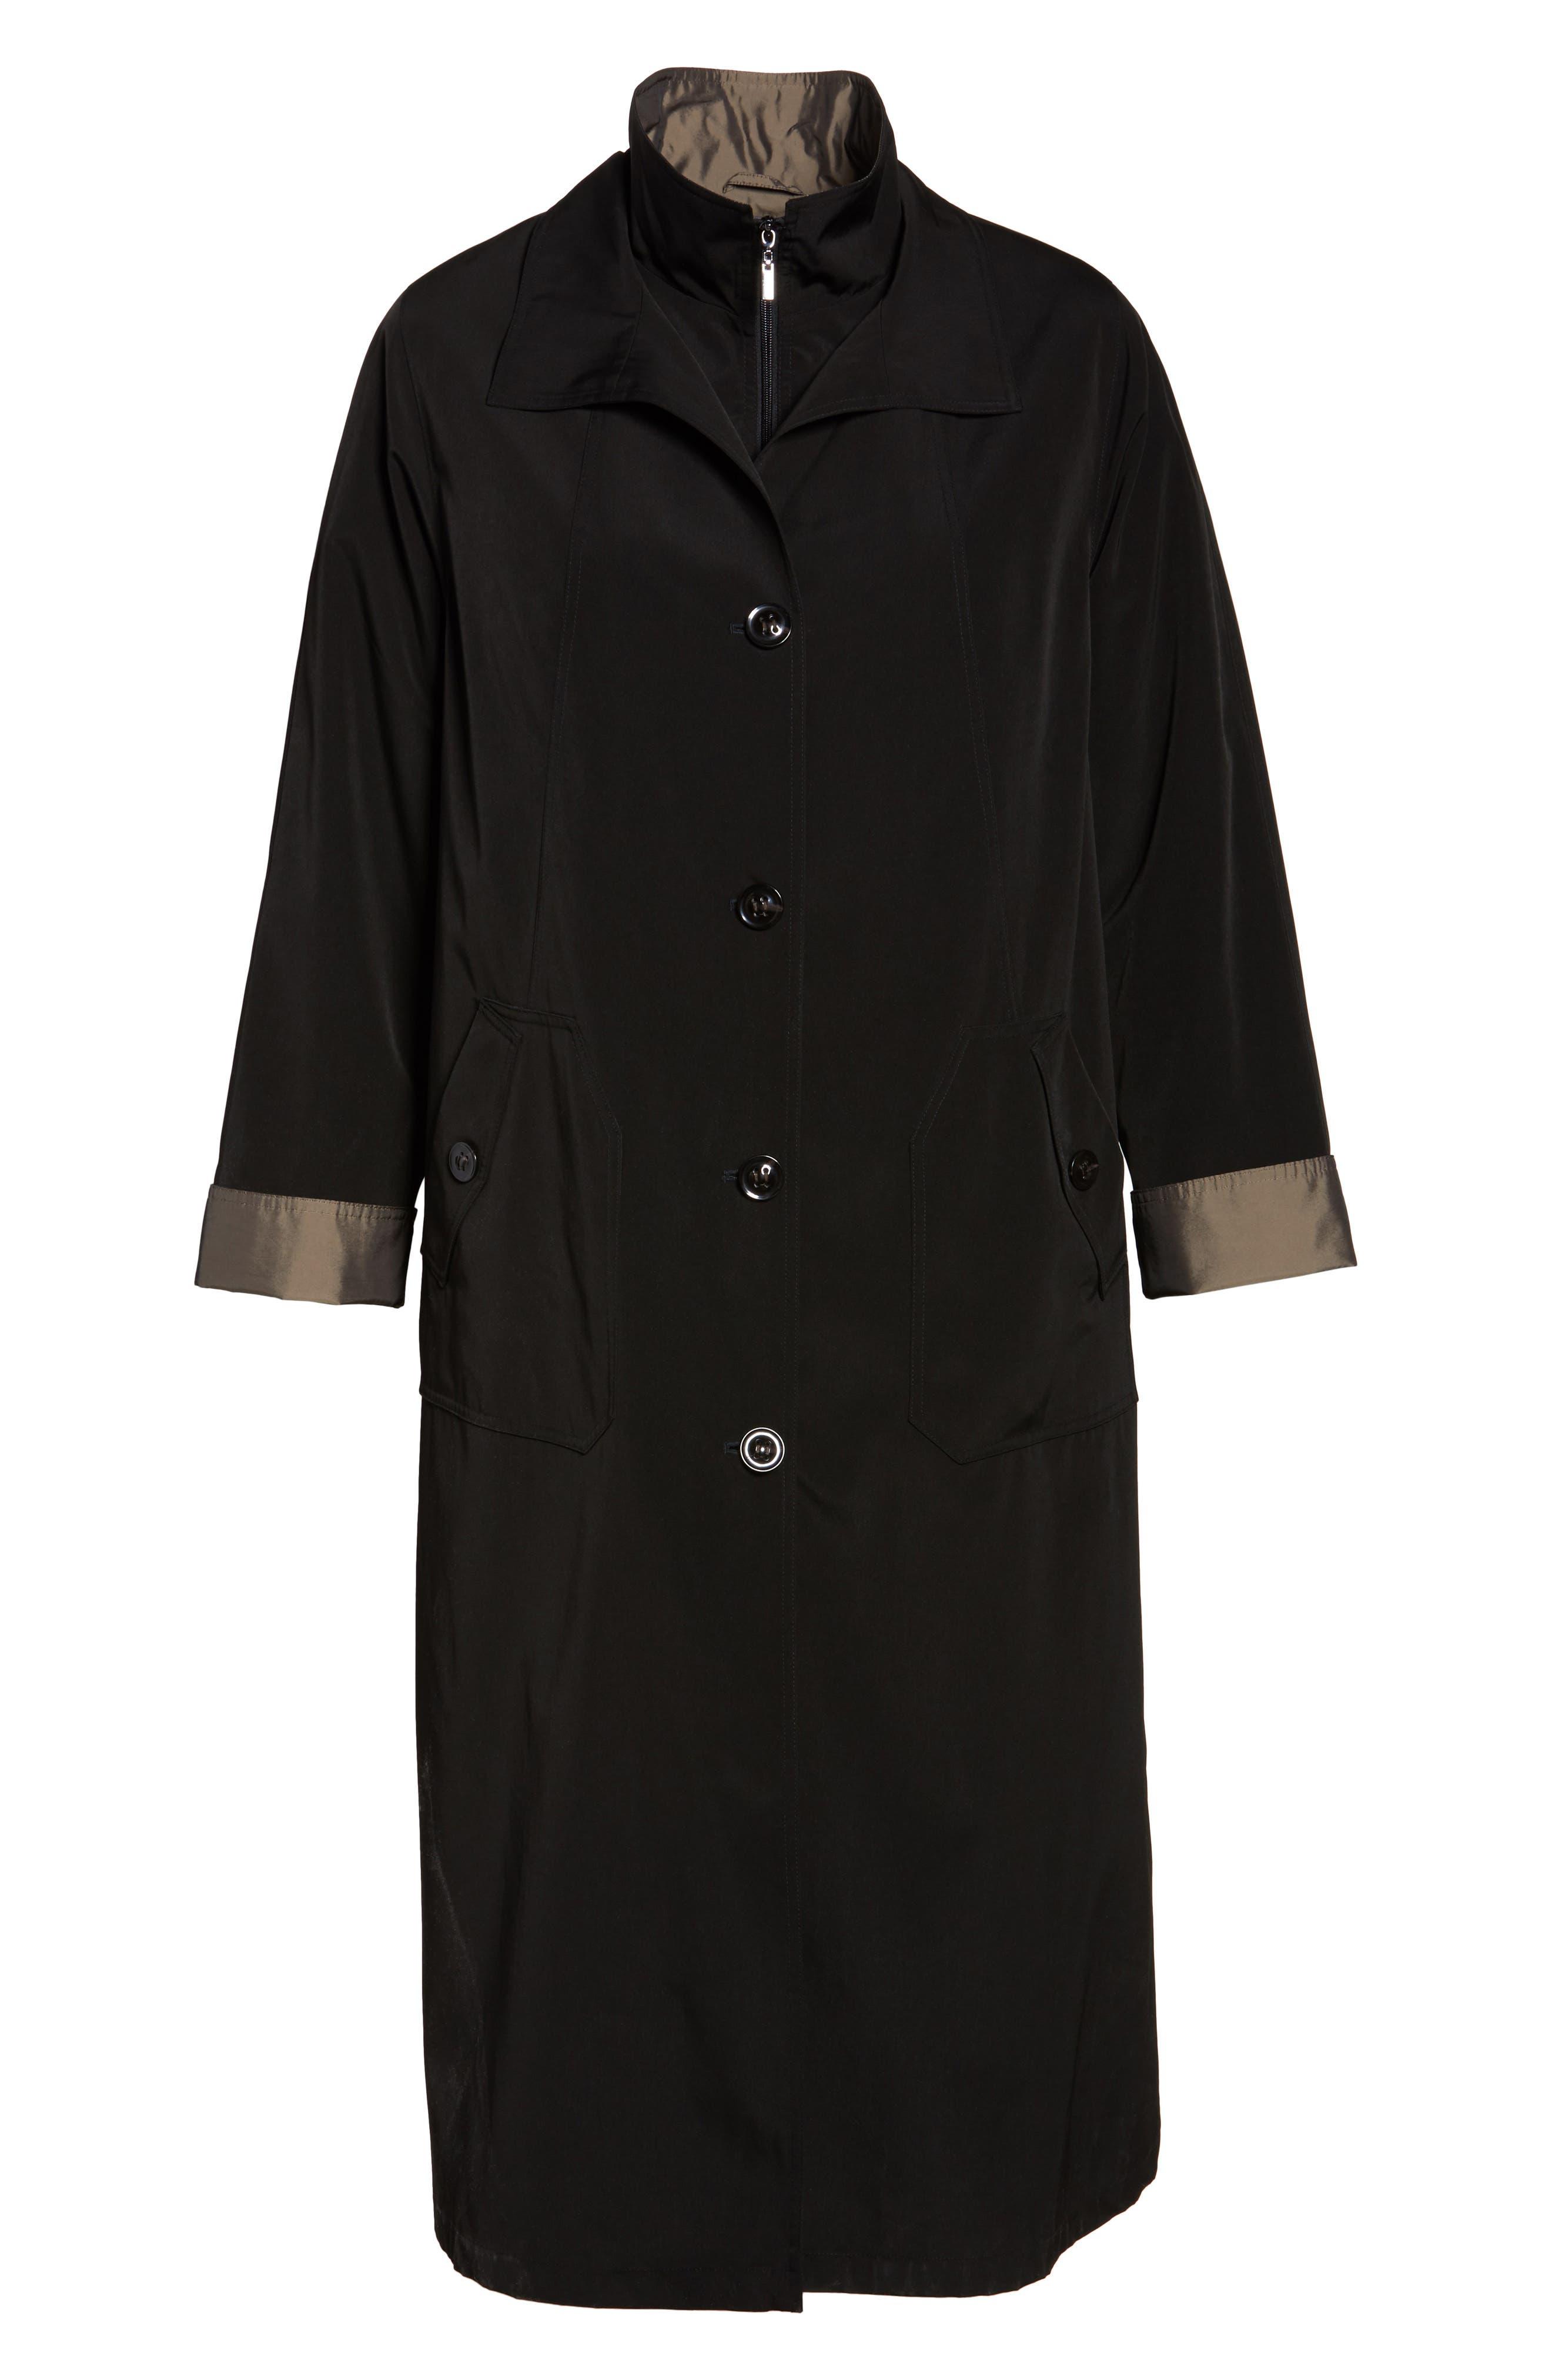 Long Raincoat with Detachable Hood & Liner,                             Alternate thumbnail 5, color,                             BLACK